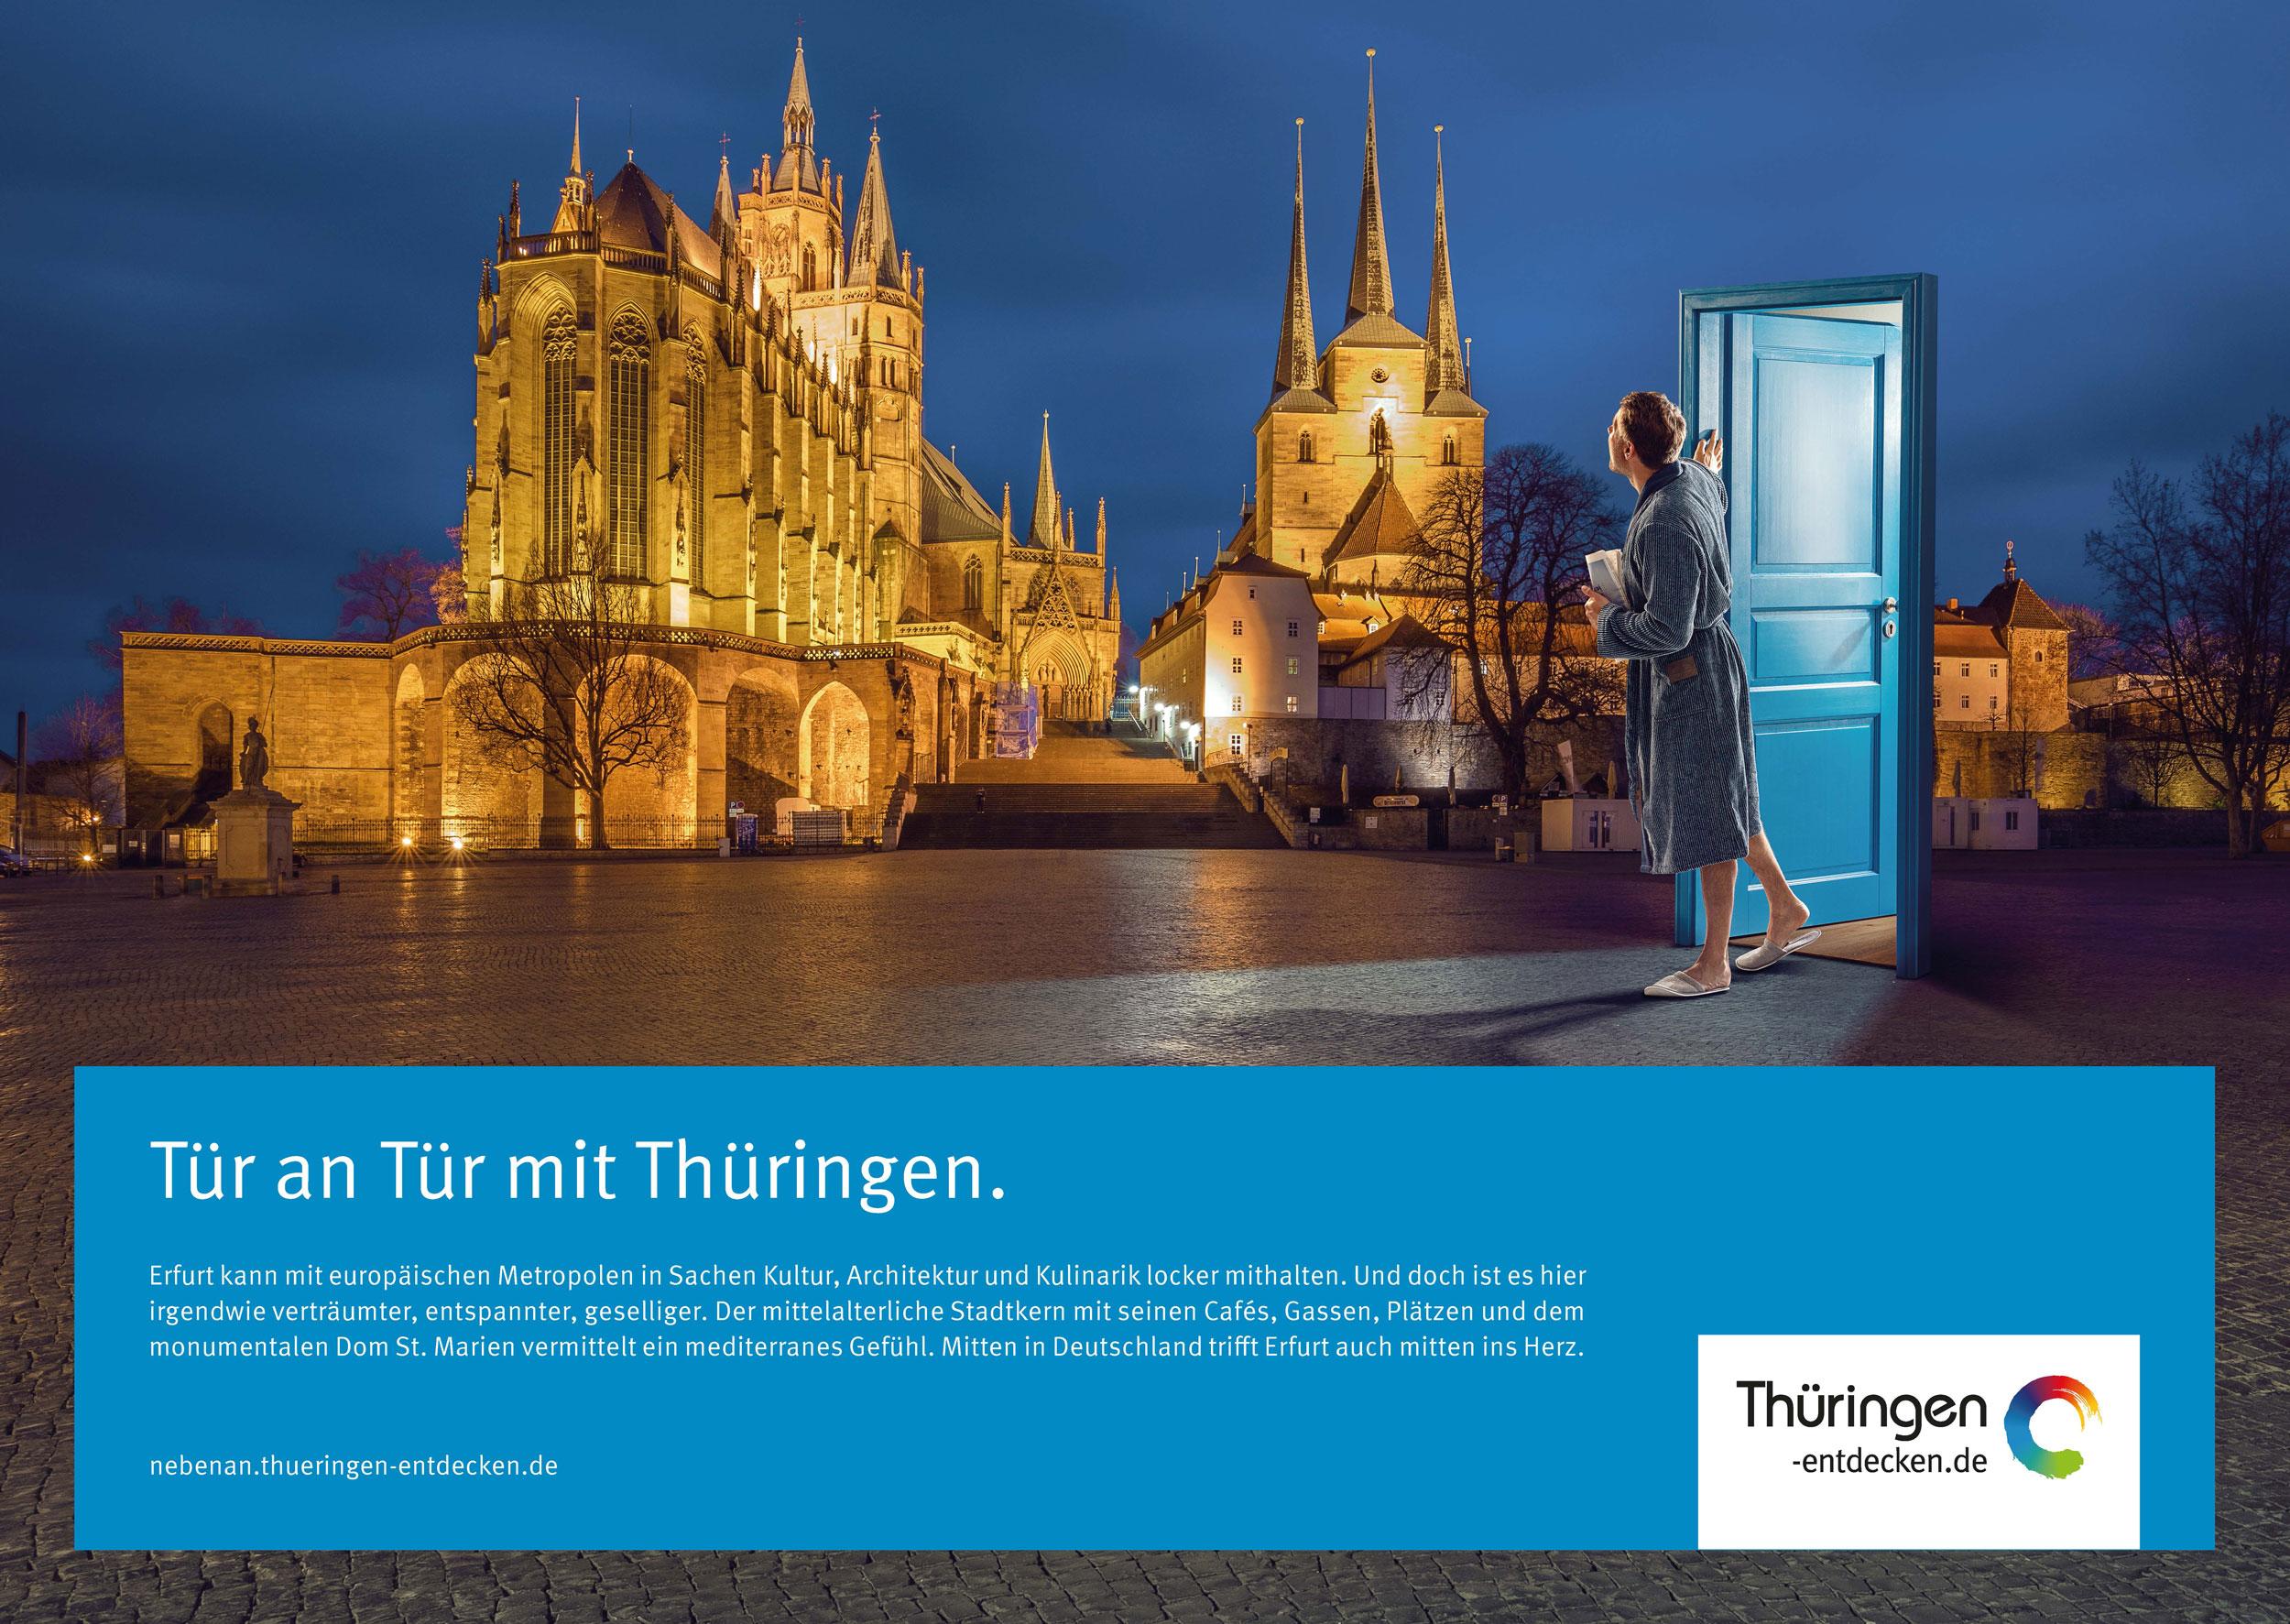 Tür an Tür mit Thüringen 18/1-Motiv Erfurt